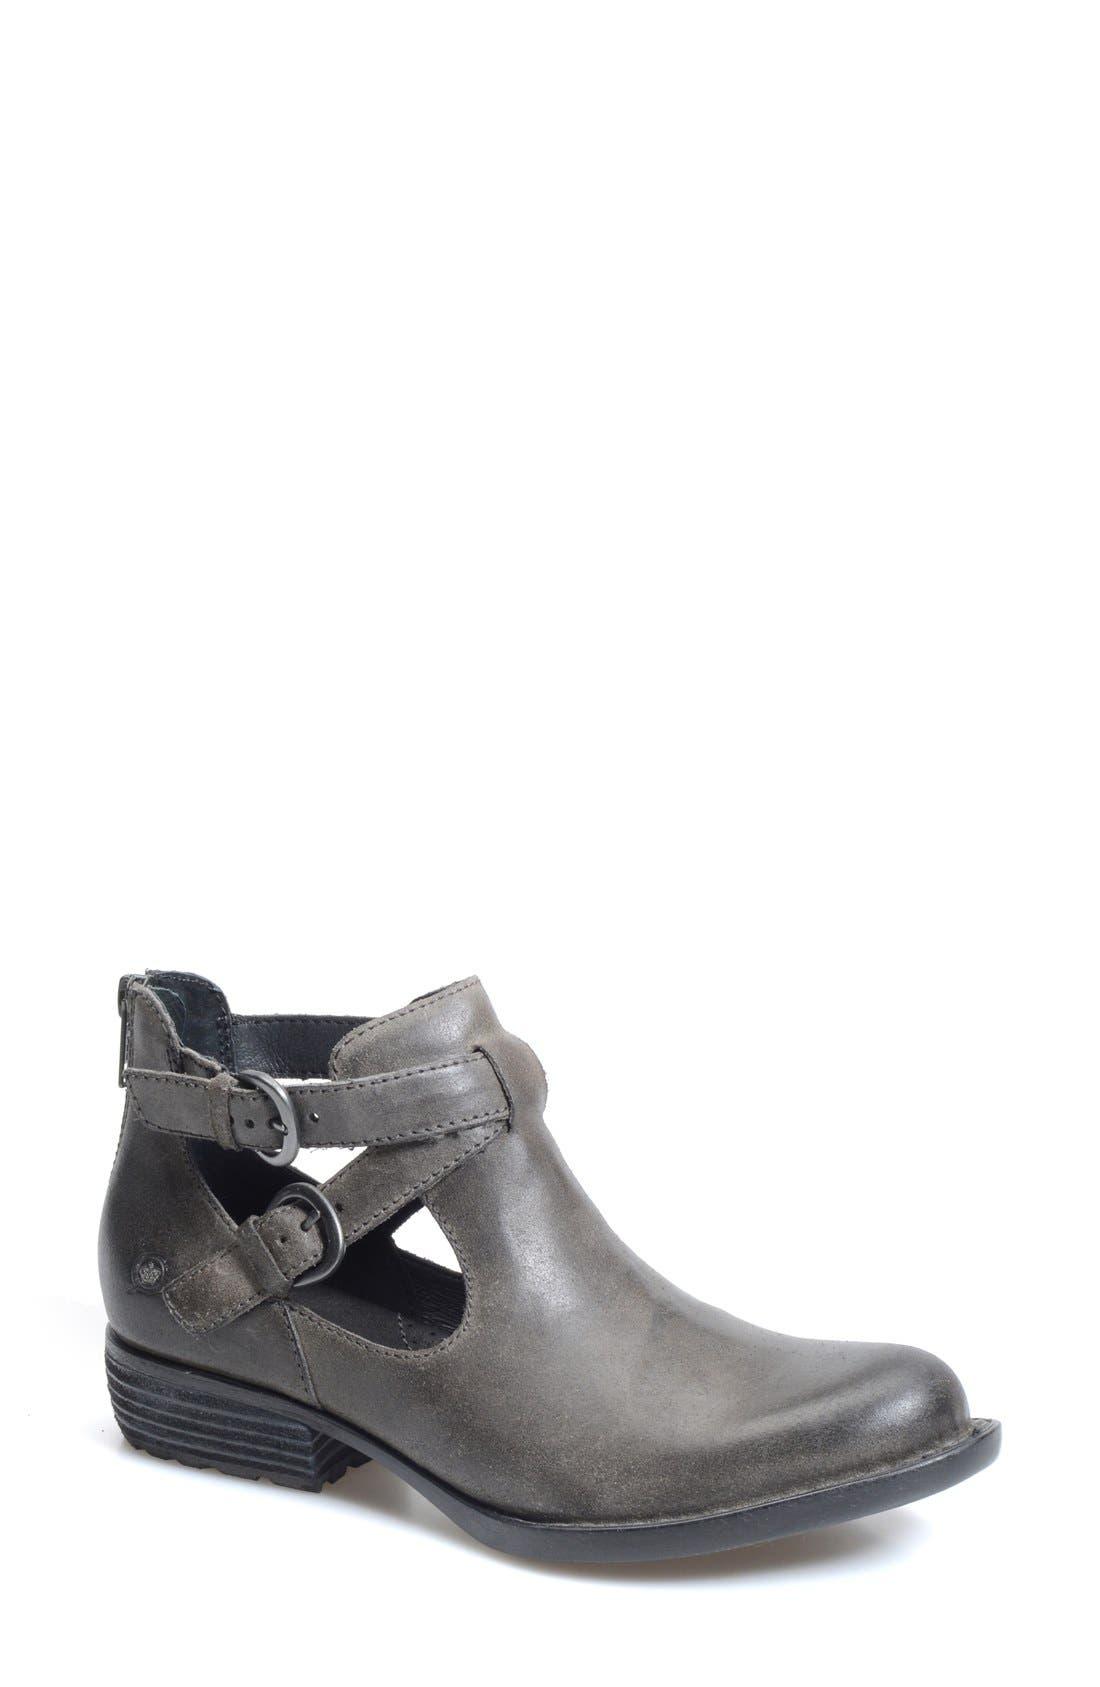 Alternate Image 1 Selected - Børn 'Kamilla' Cutout Ankle Boot (Women)